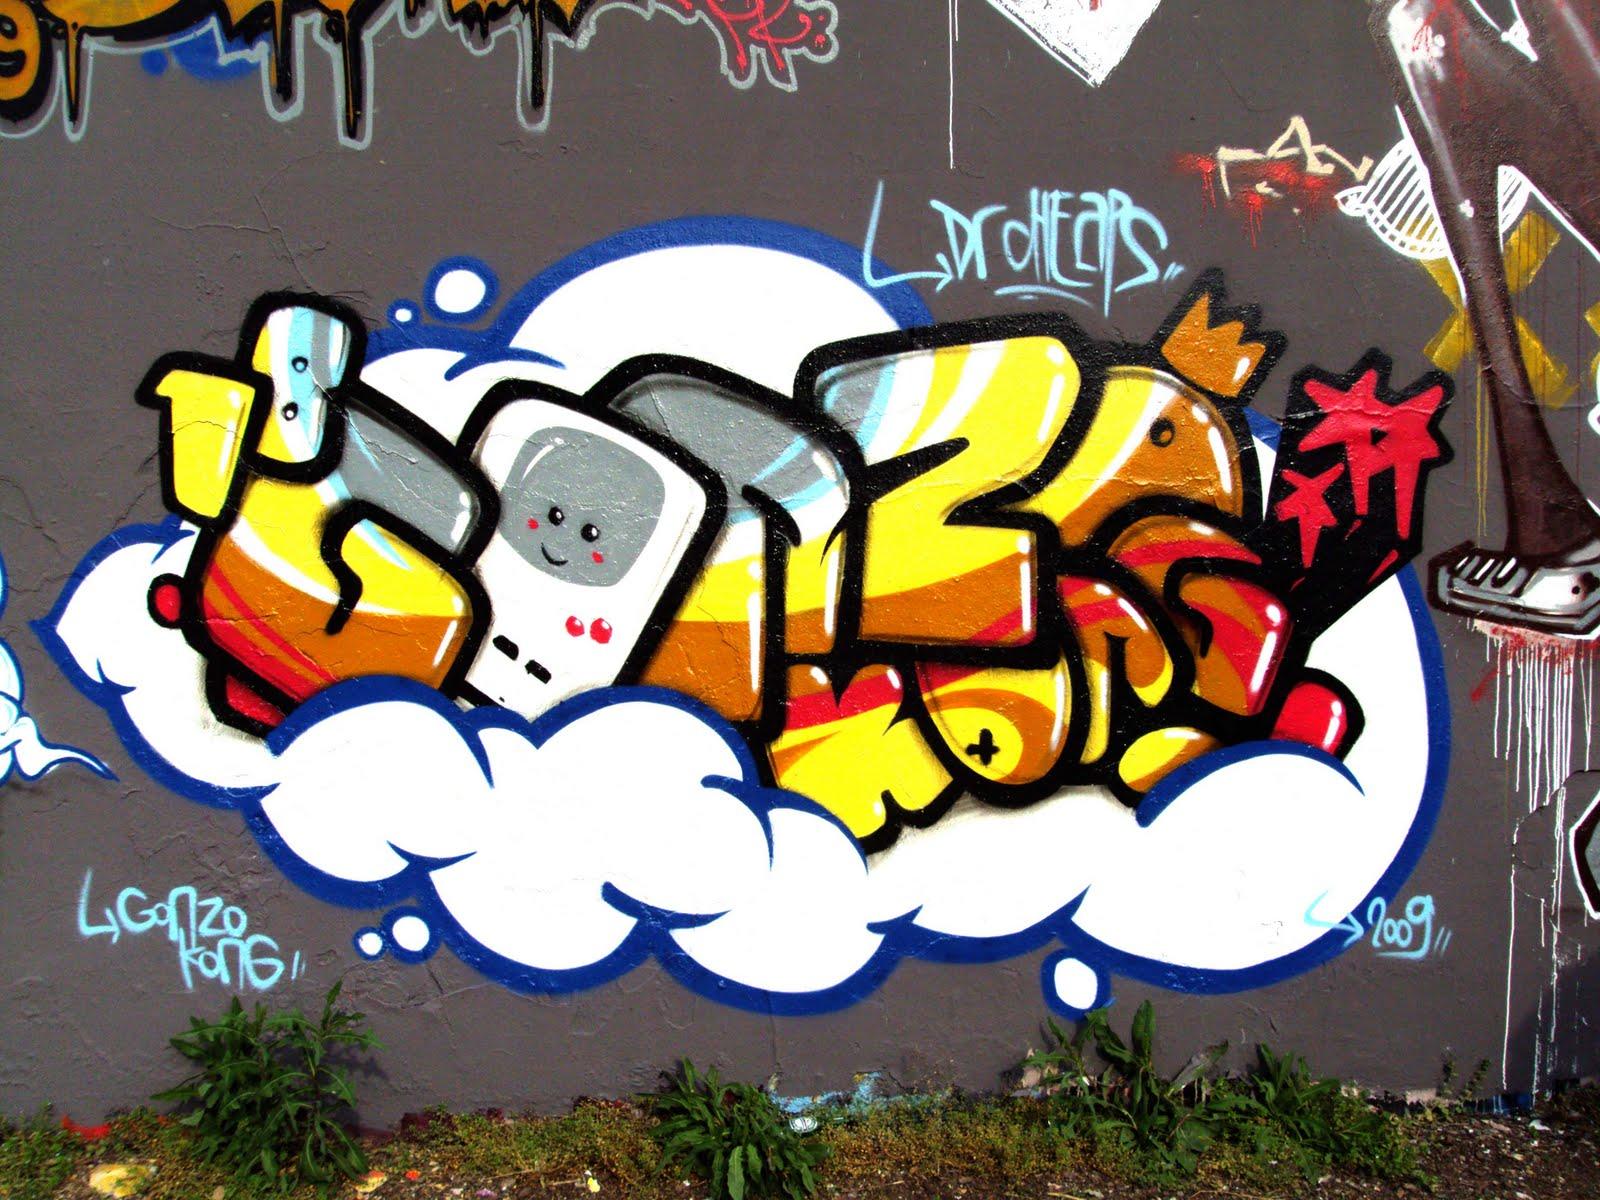 ... : GRAFFIRI ALPHABETS BUBBLE >> GonZo's Best Graffiti Alphabets Bubble